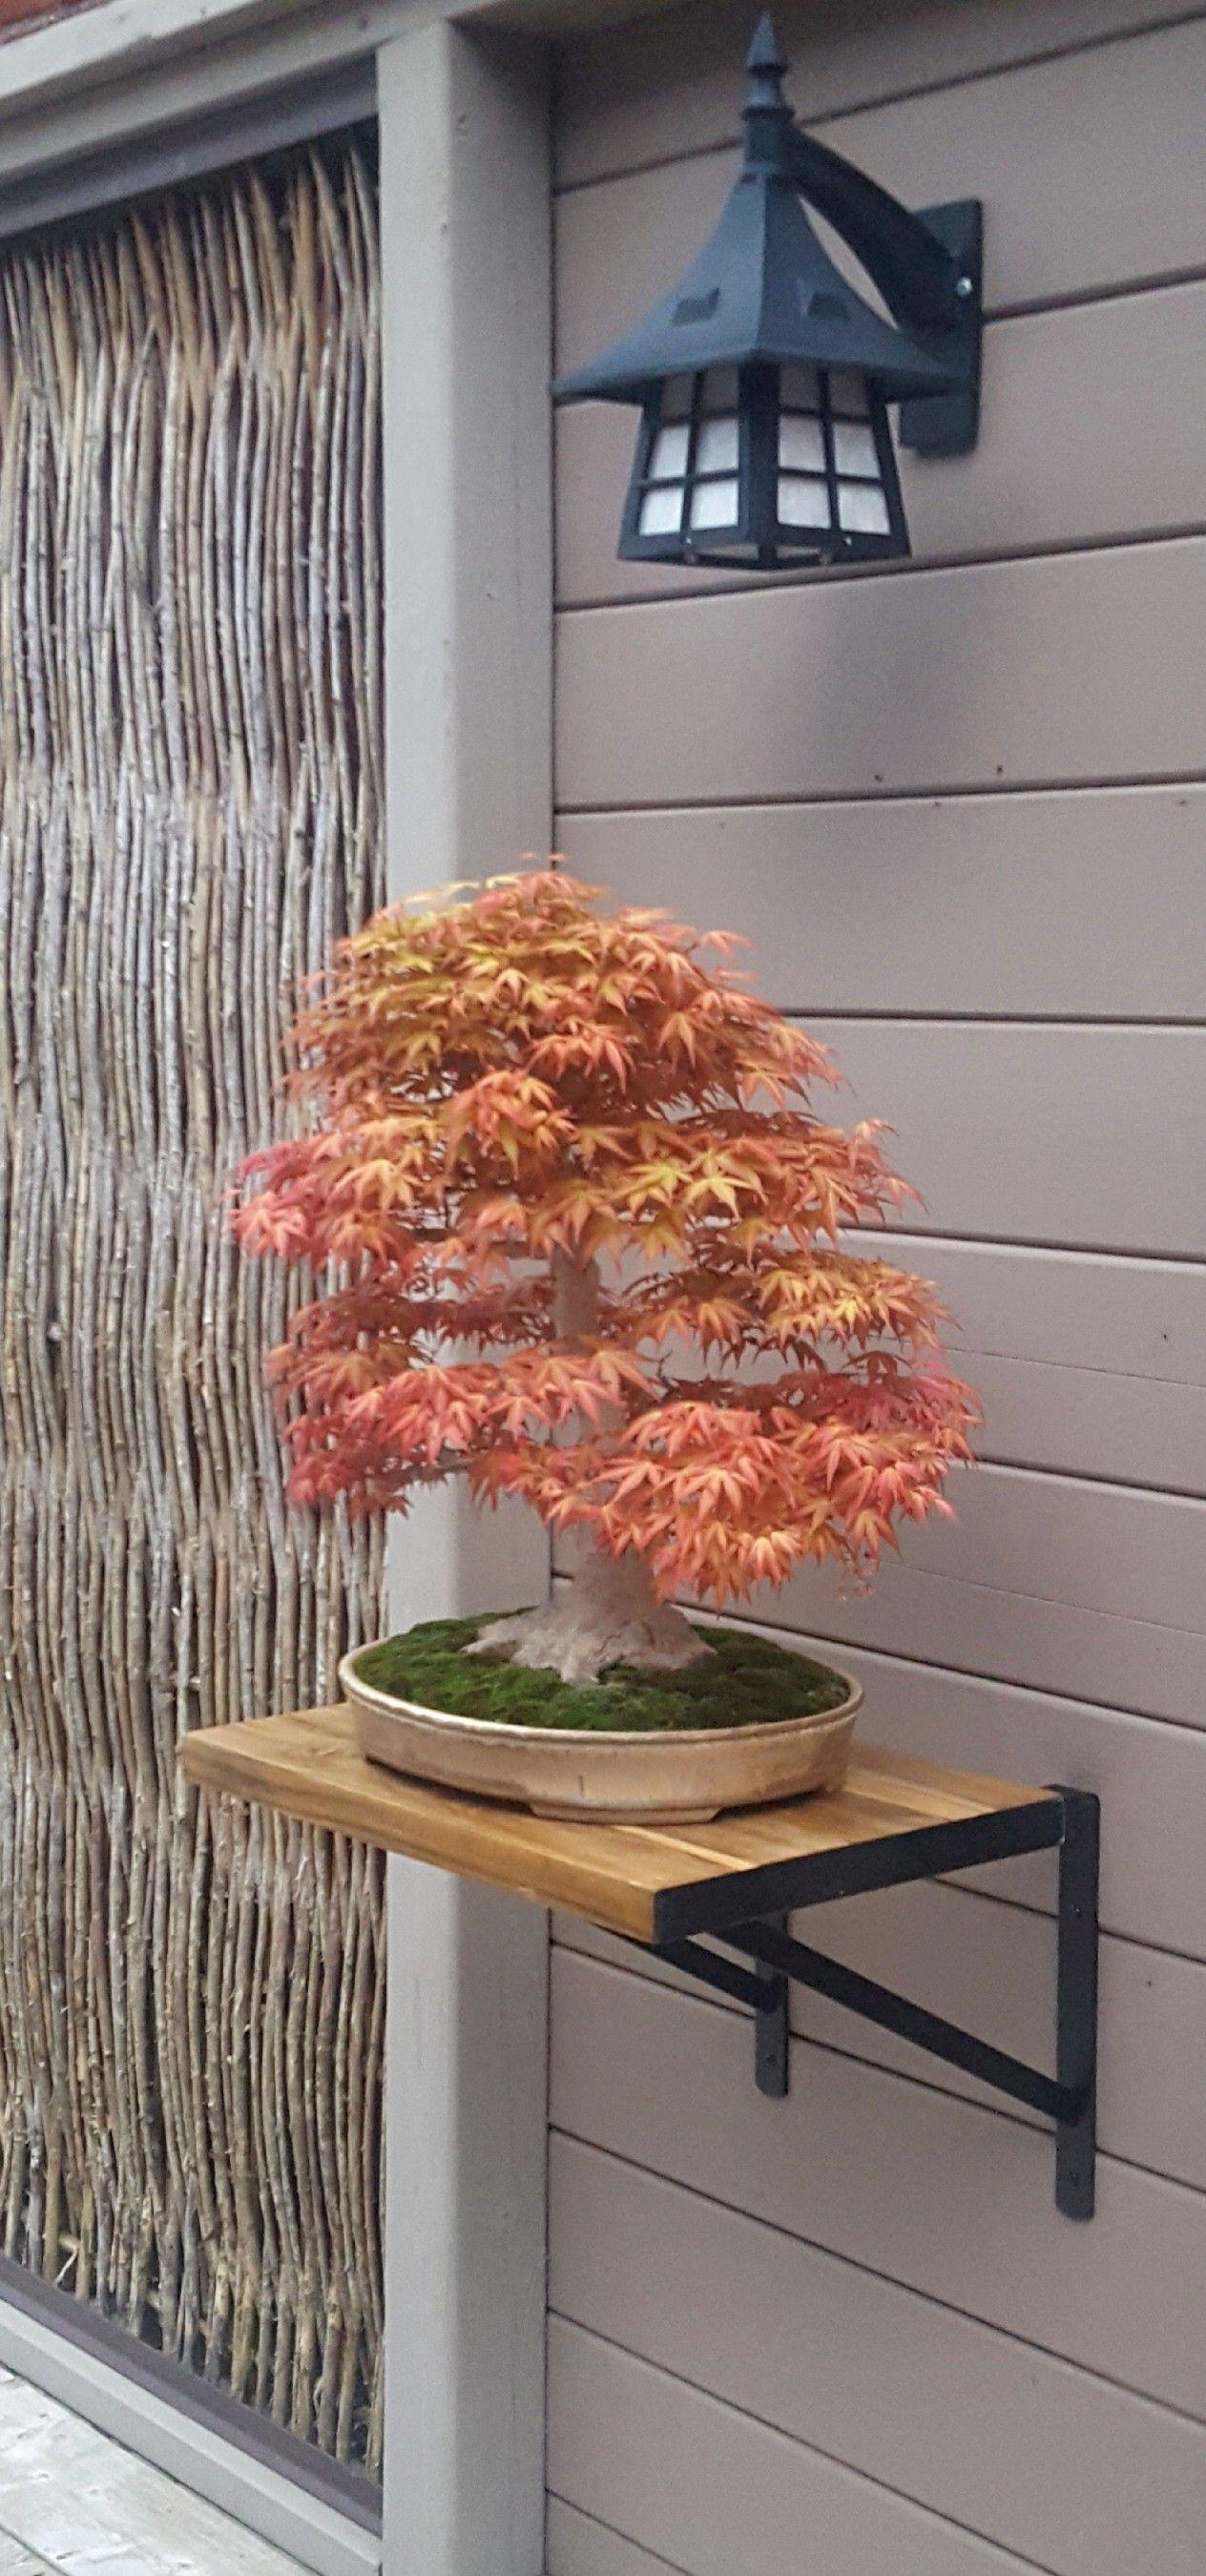 Japanese Maple Benichiodoi #japanesemaple